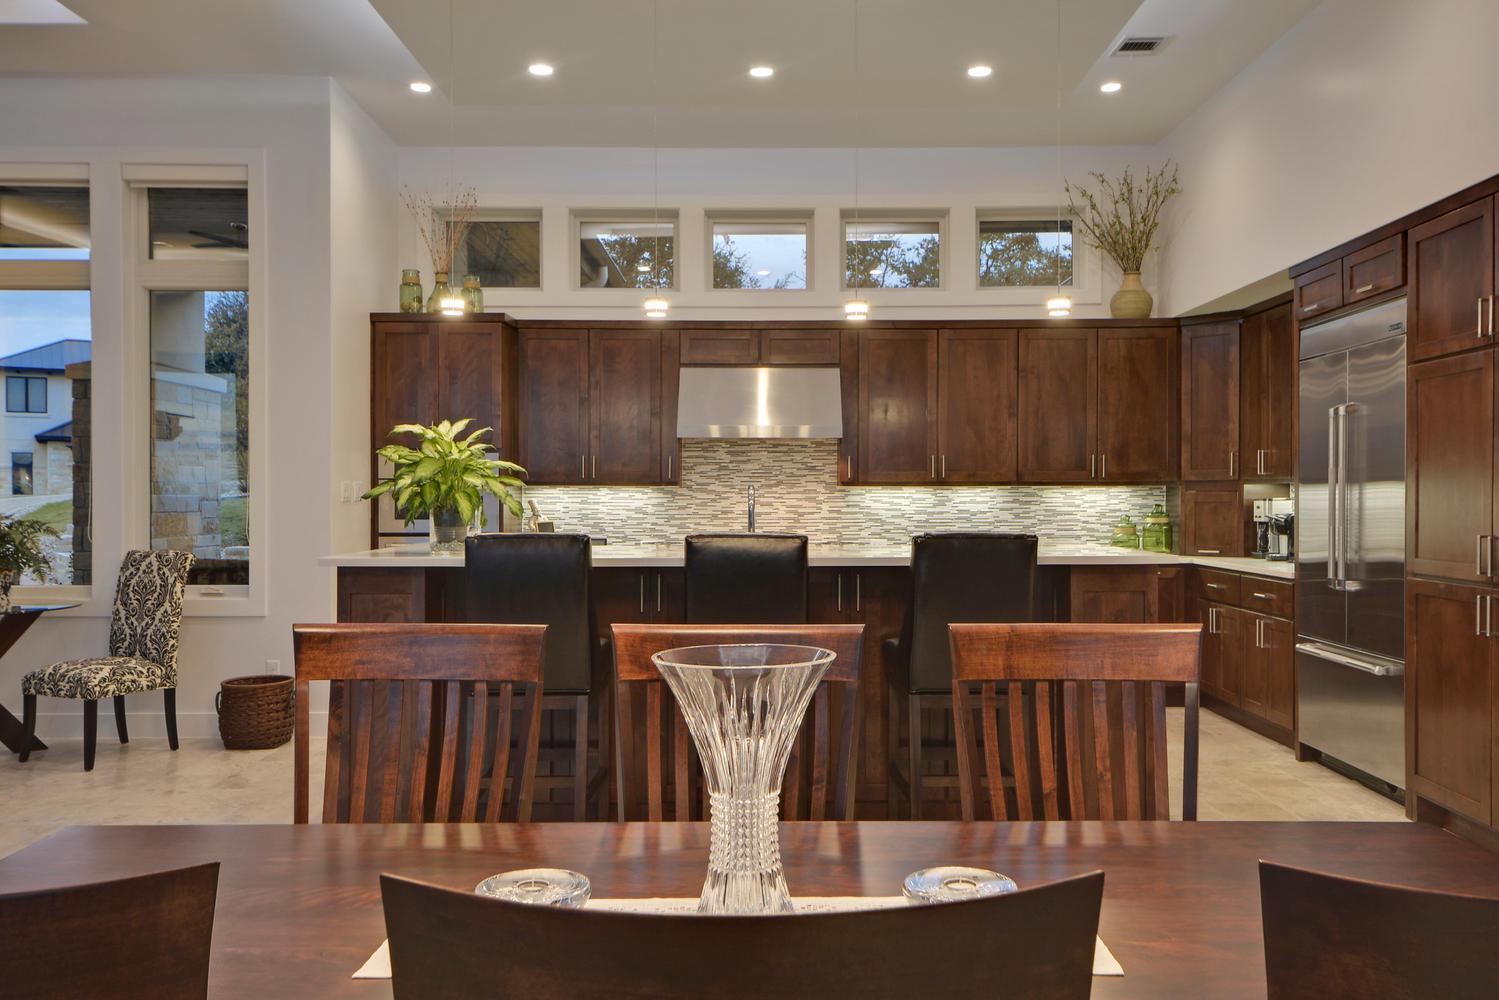 8101 Magnolia Ridge Cove-large-024-5-Kitchen and Breakfast 14-1499x1000-72dpi.jpg